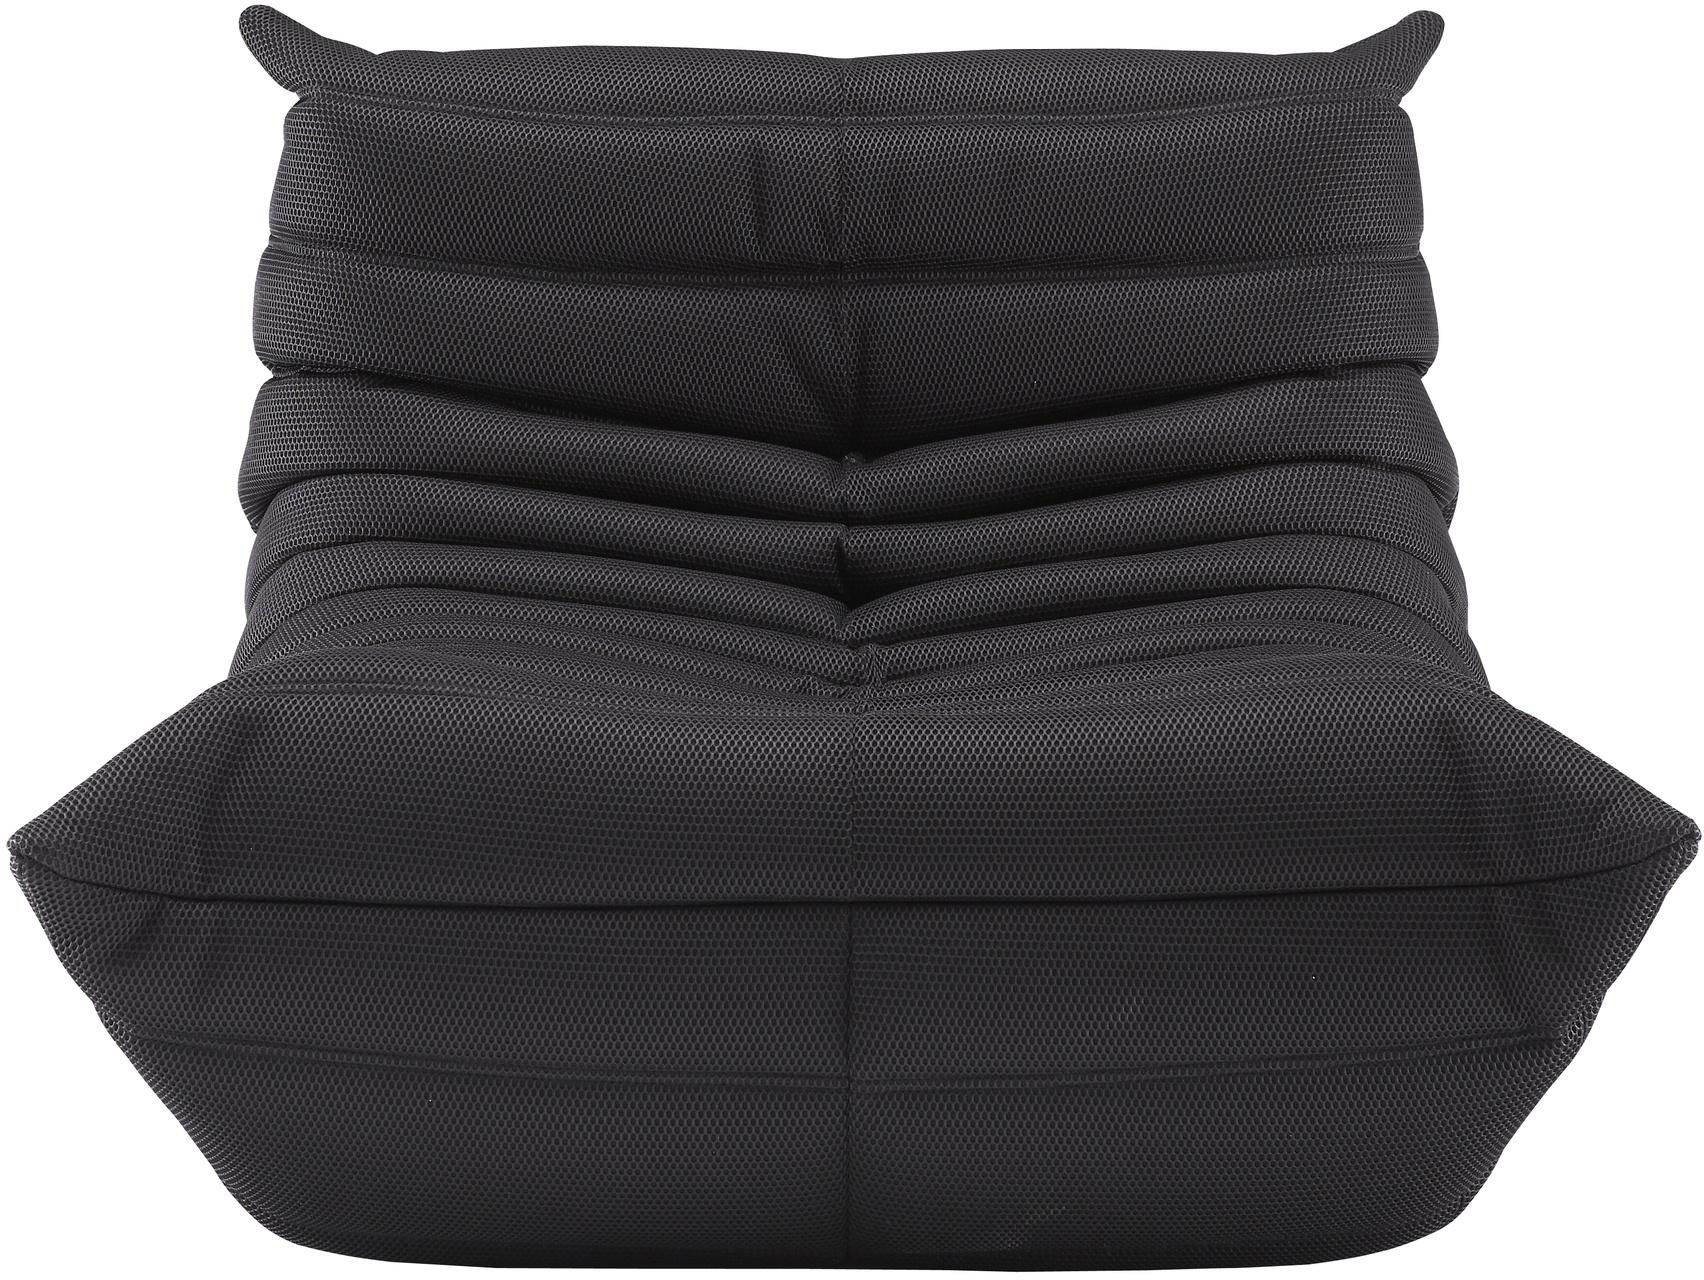 Togo fauteuils designer michel ducaroy ligne roset - Fauteuil ligne roset togo ...